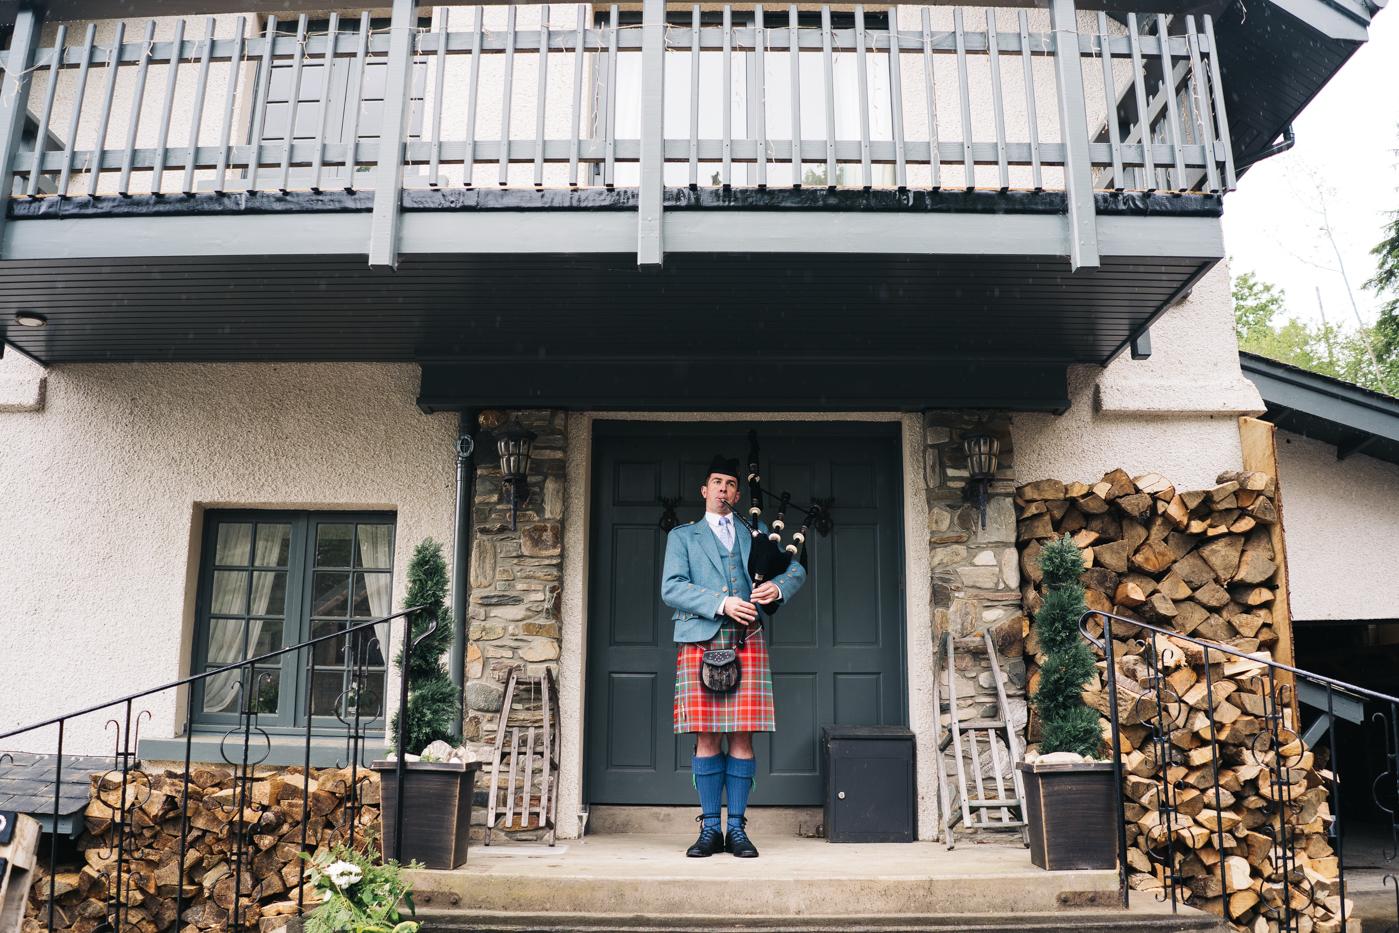 scottish-wedding-trossachs-loch-tay-highlannds-relaxed-photography-photographer-0011.jpg